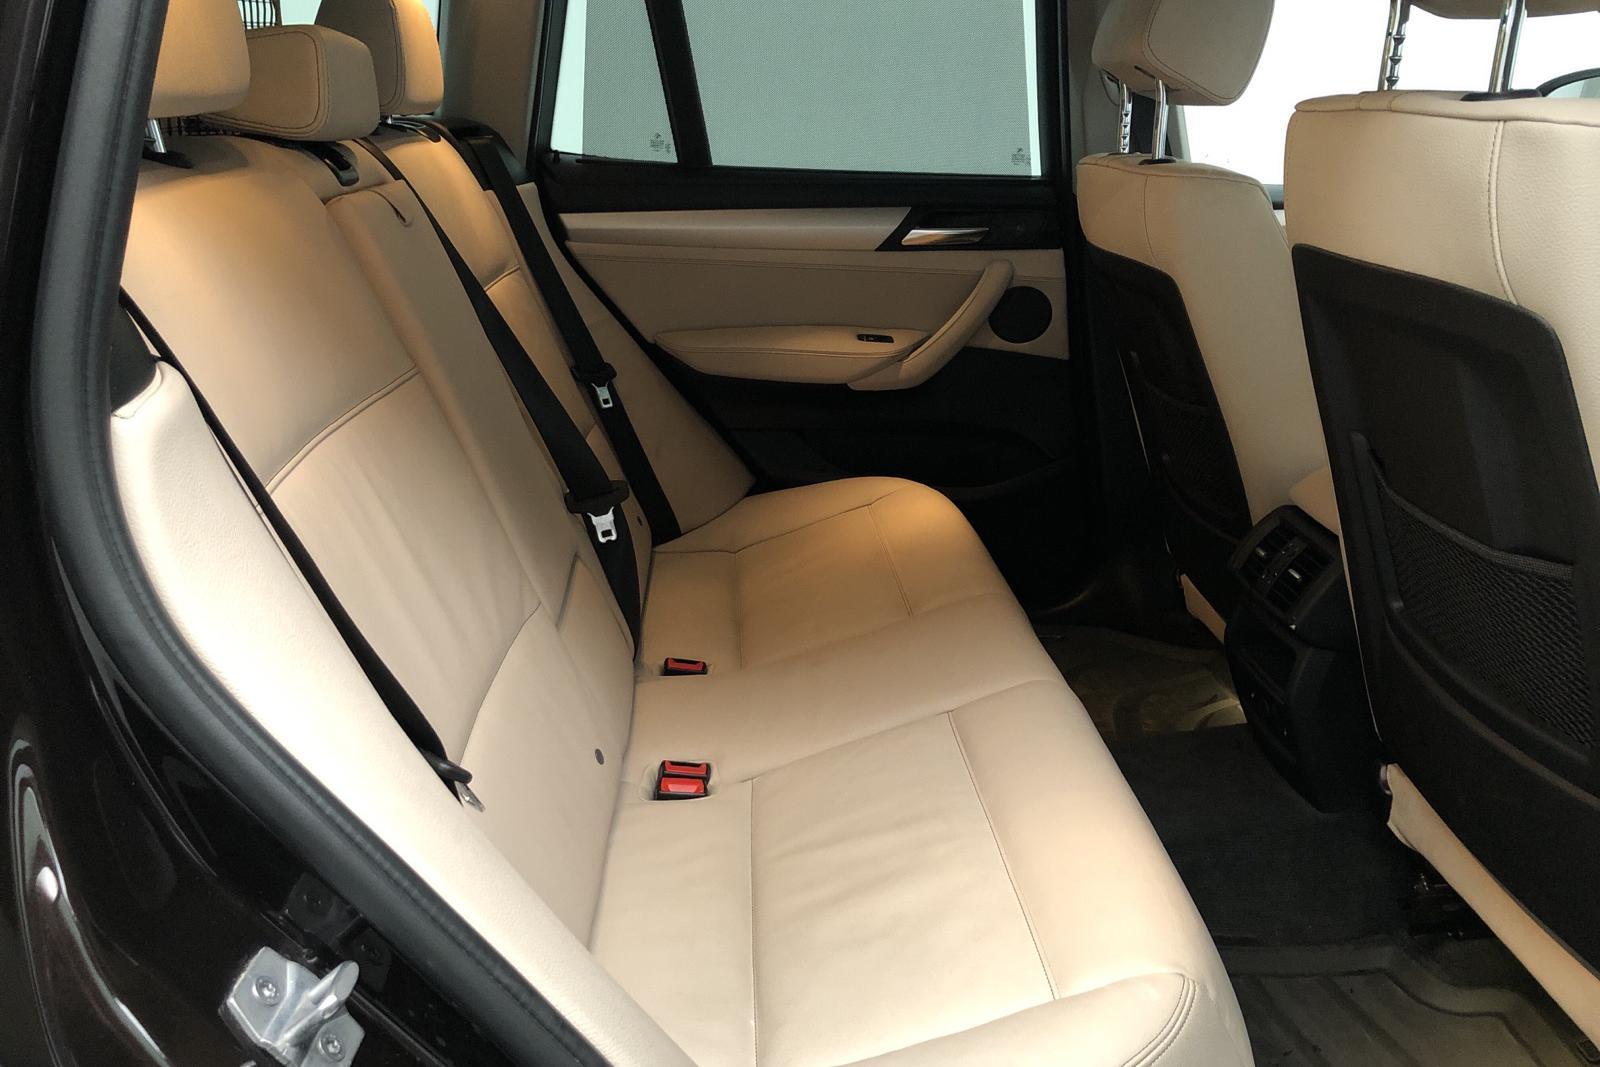 BMW X3 xDrive30d, F25 (258hk) - 165 000 km - Automatic - brown - 2016